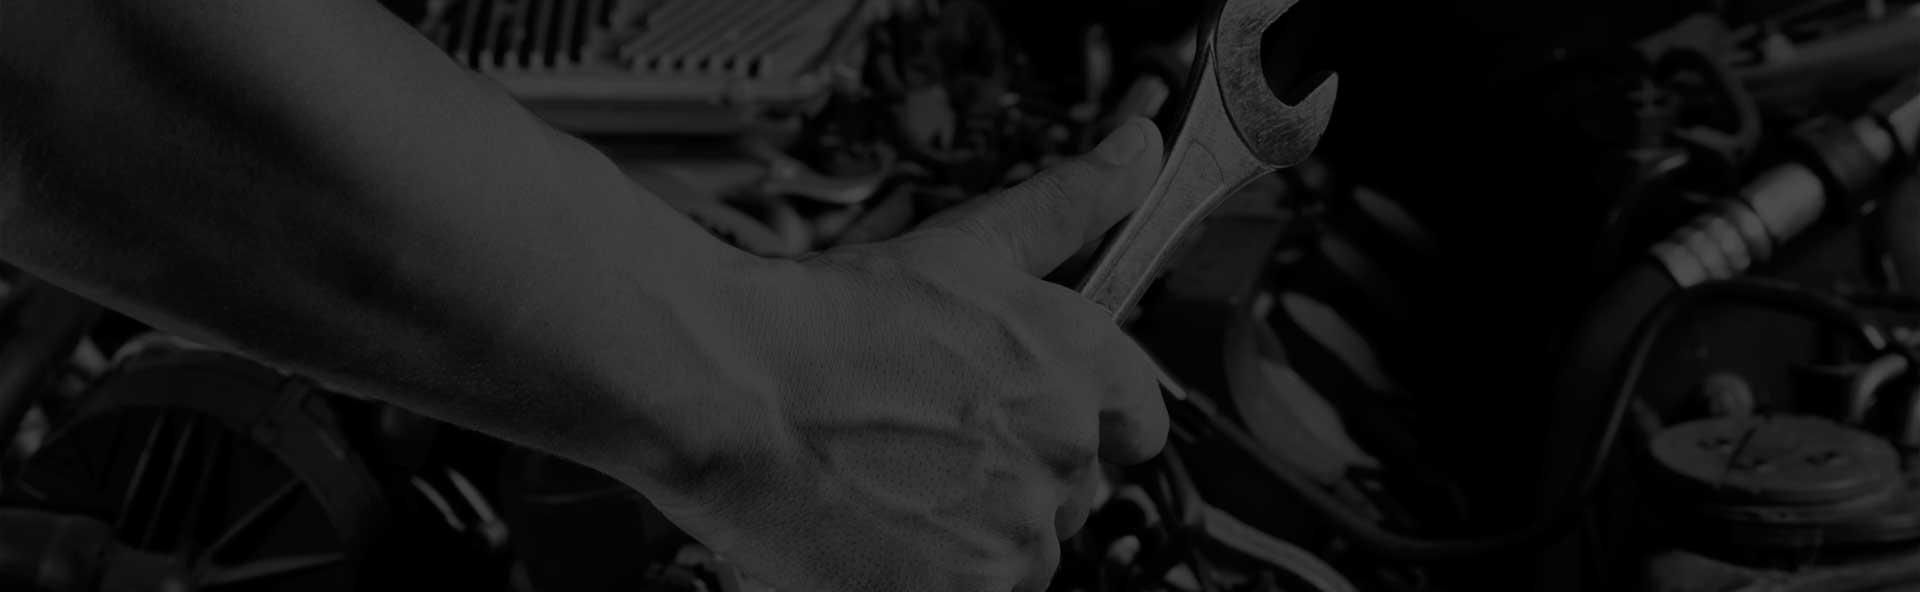 K&M Automotive only uses competent qualified technicians